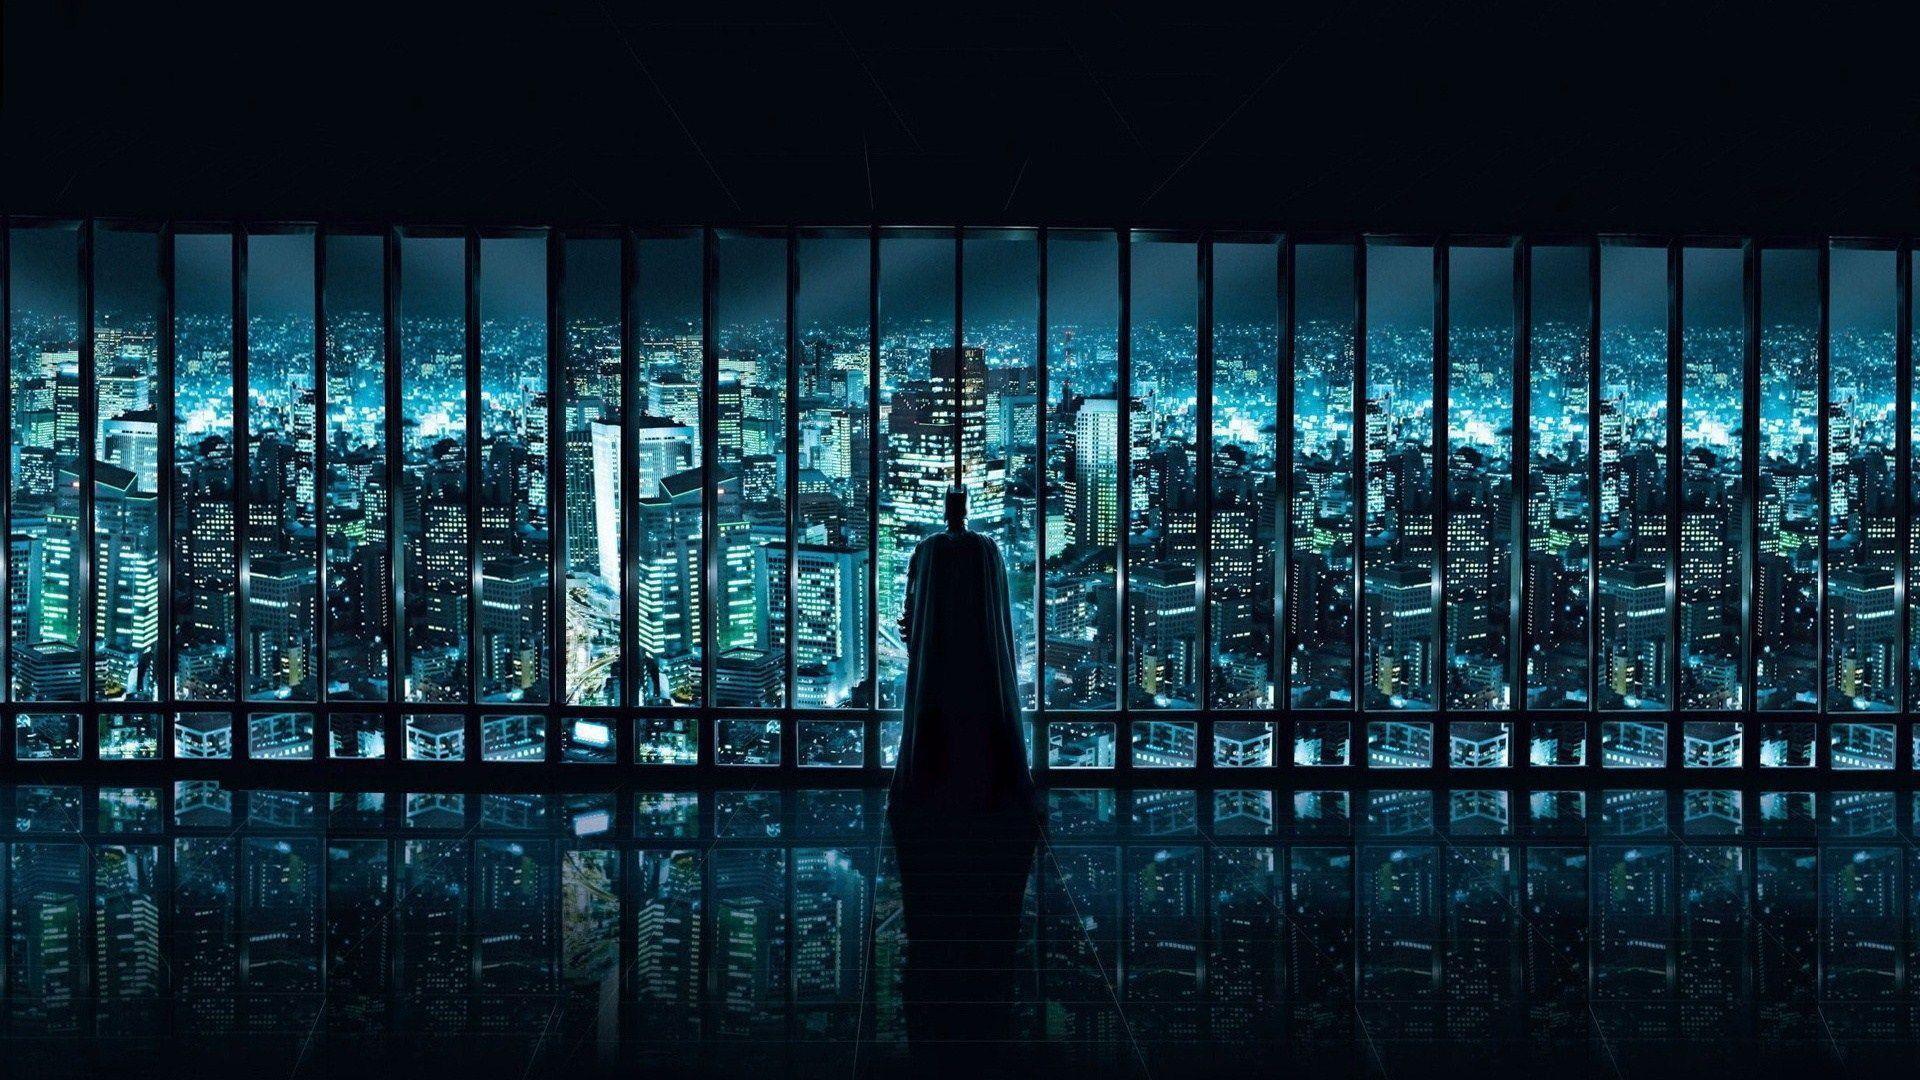 Batman HD Wallpapers | Full HD Wallpapers Batman | Cool Wallpapers